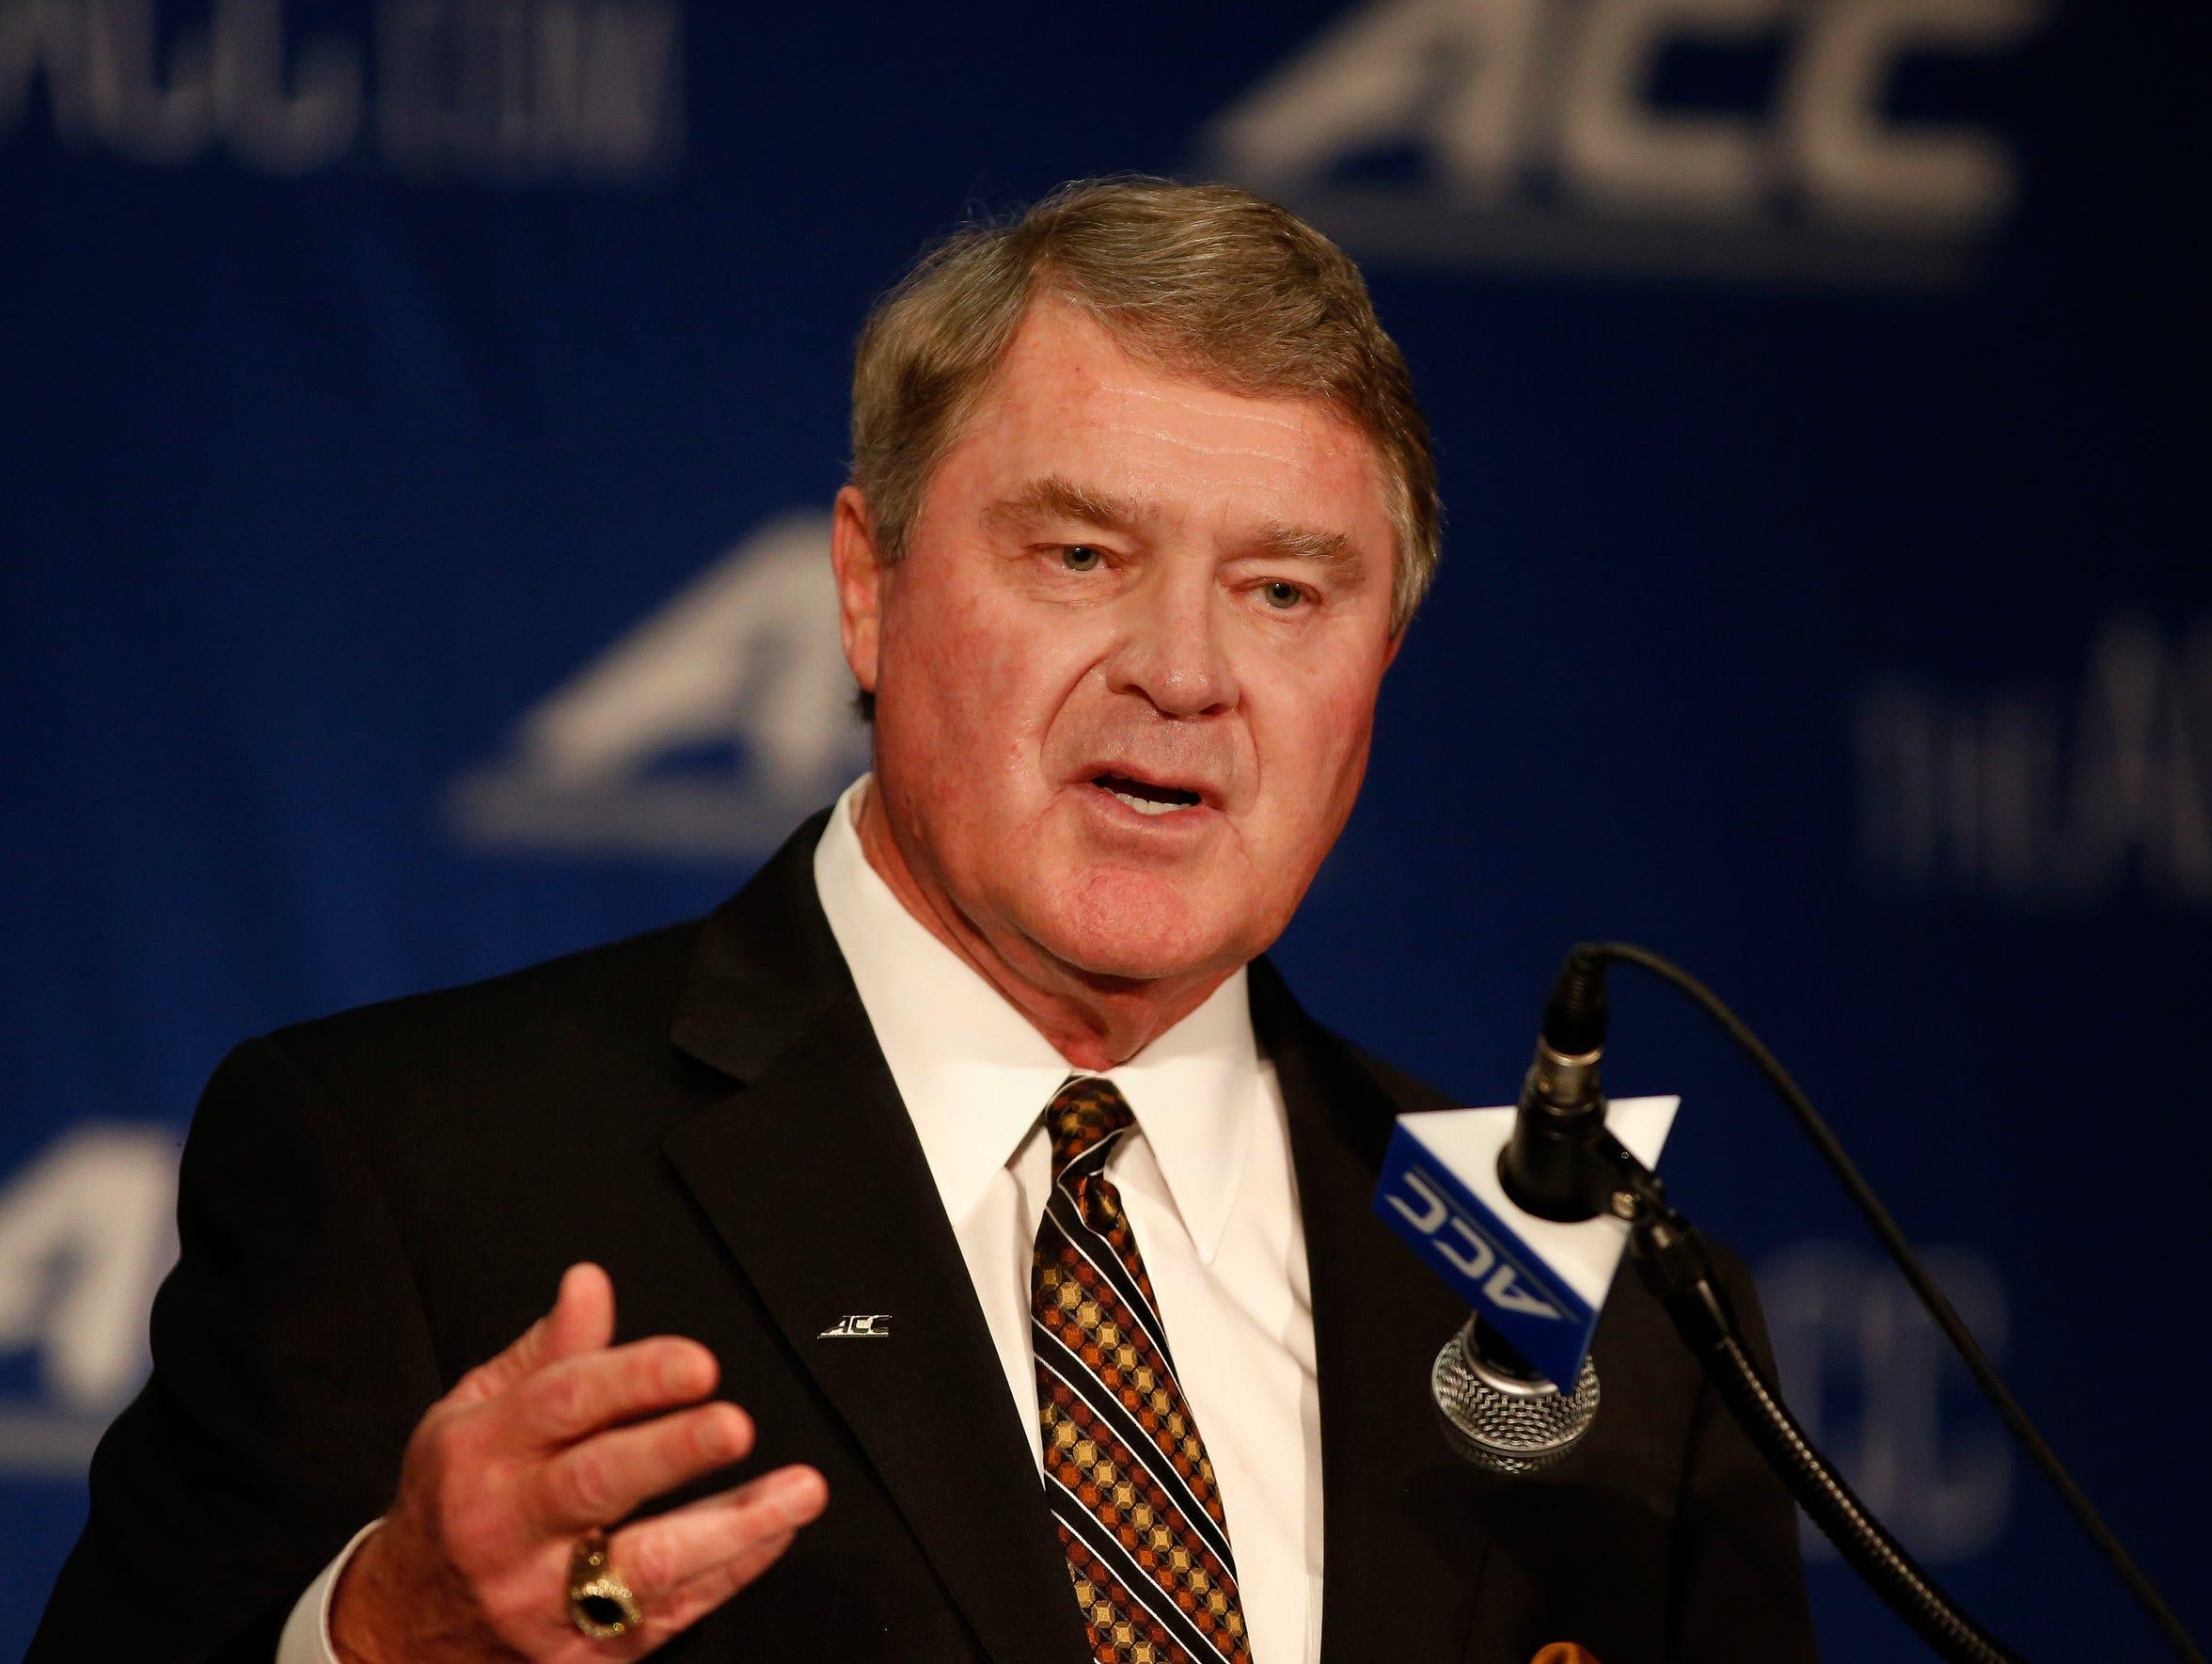 Atlantic Coast Conference commissioner John Swofford